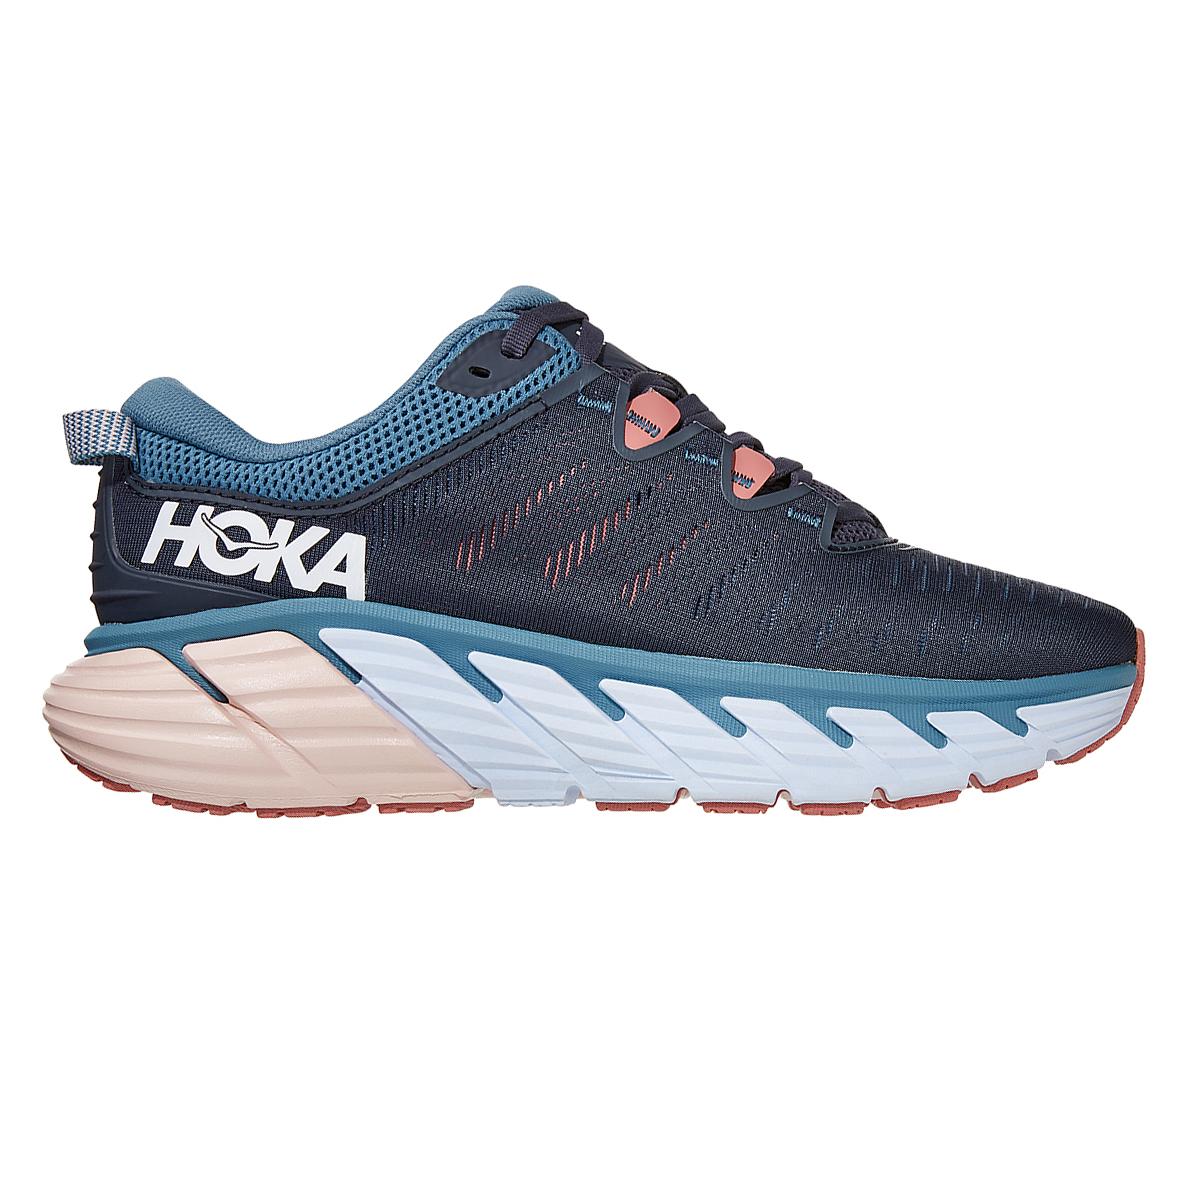 Women's Hoka One One Gaviota 3 Running Shoe - Color: Ombre Blue/Rosette - Size: 5 - Width: Regular, Ombre Blue/Rosette, large, image 1